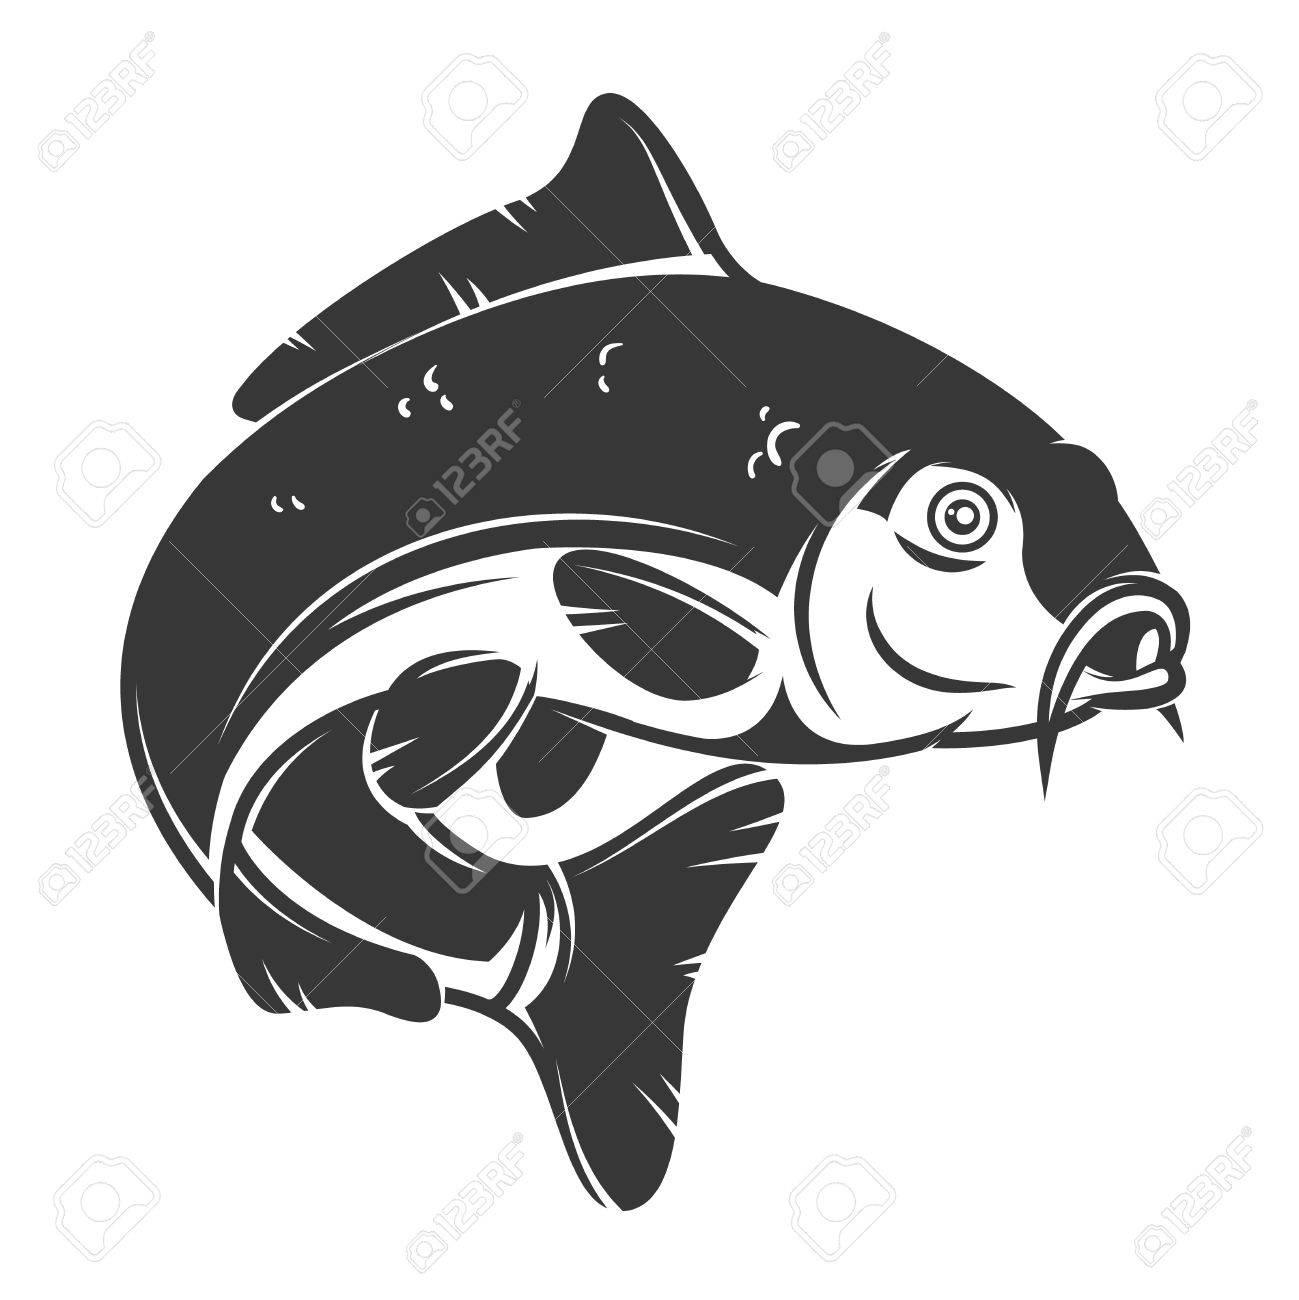 carp fish isolated on white background design element for logo rh 123rf com carp logo design carp logo